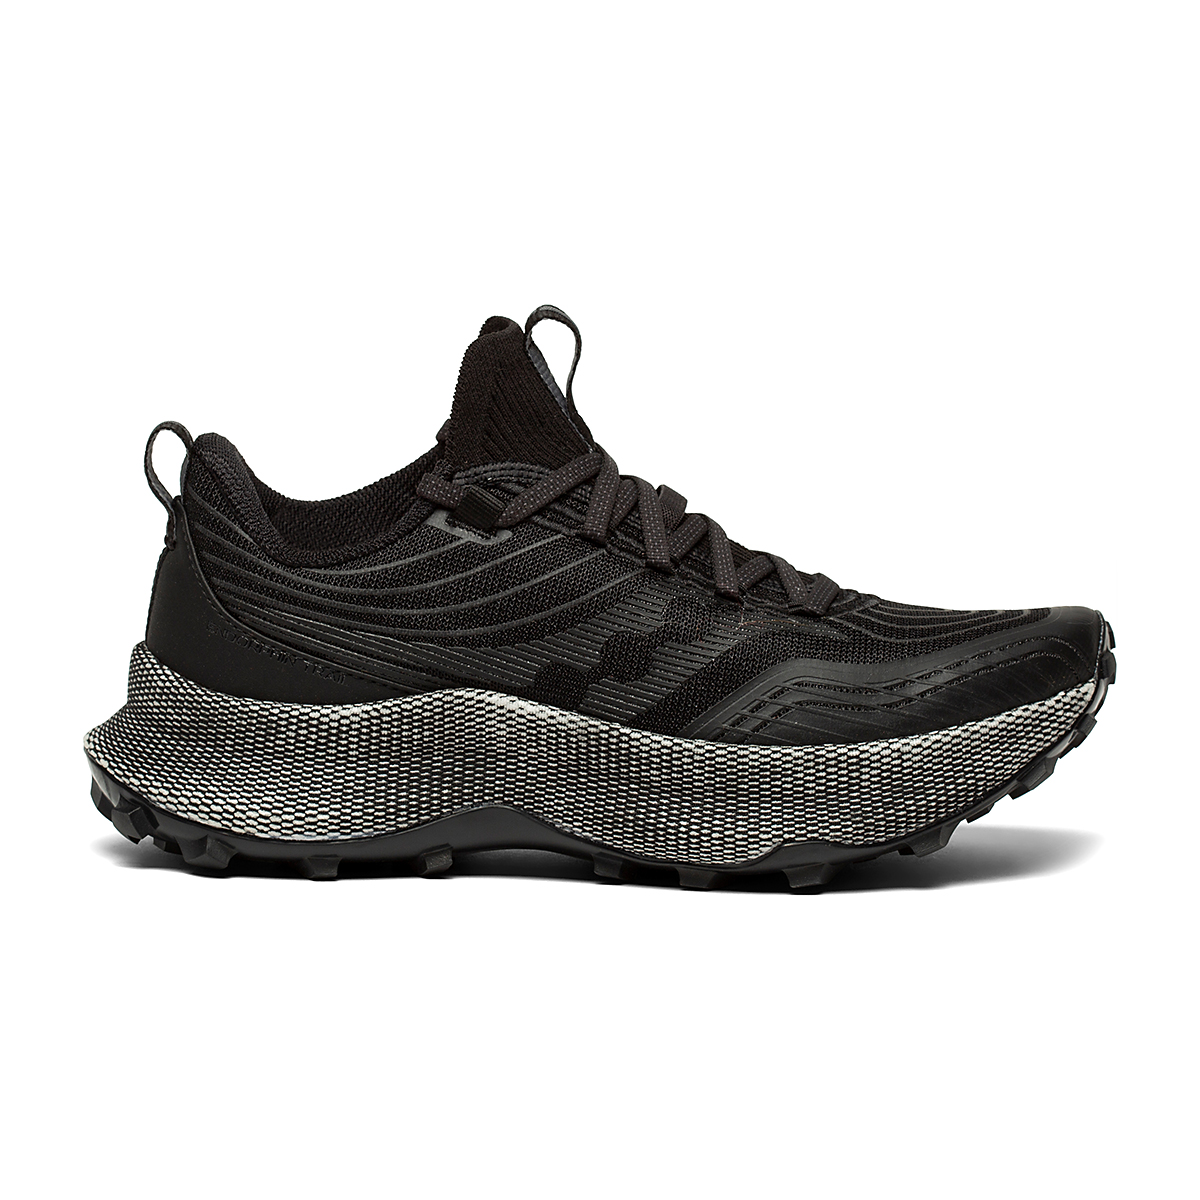 Women's Saucony Endorphin Trail Running Shoe - Color: Black/Gravel - Size: 5.5 - Width: Regular, Black/Gravel, large, image 1